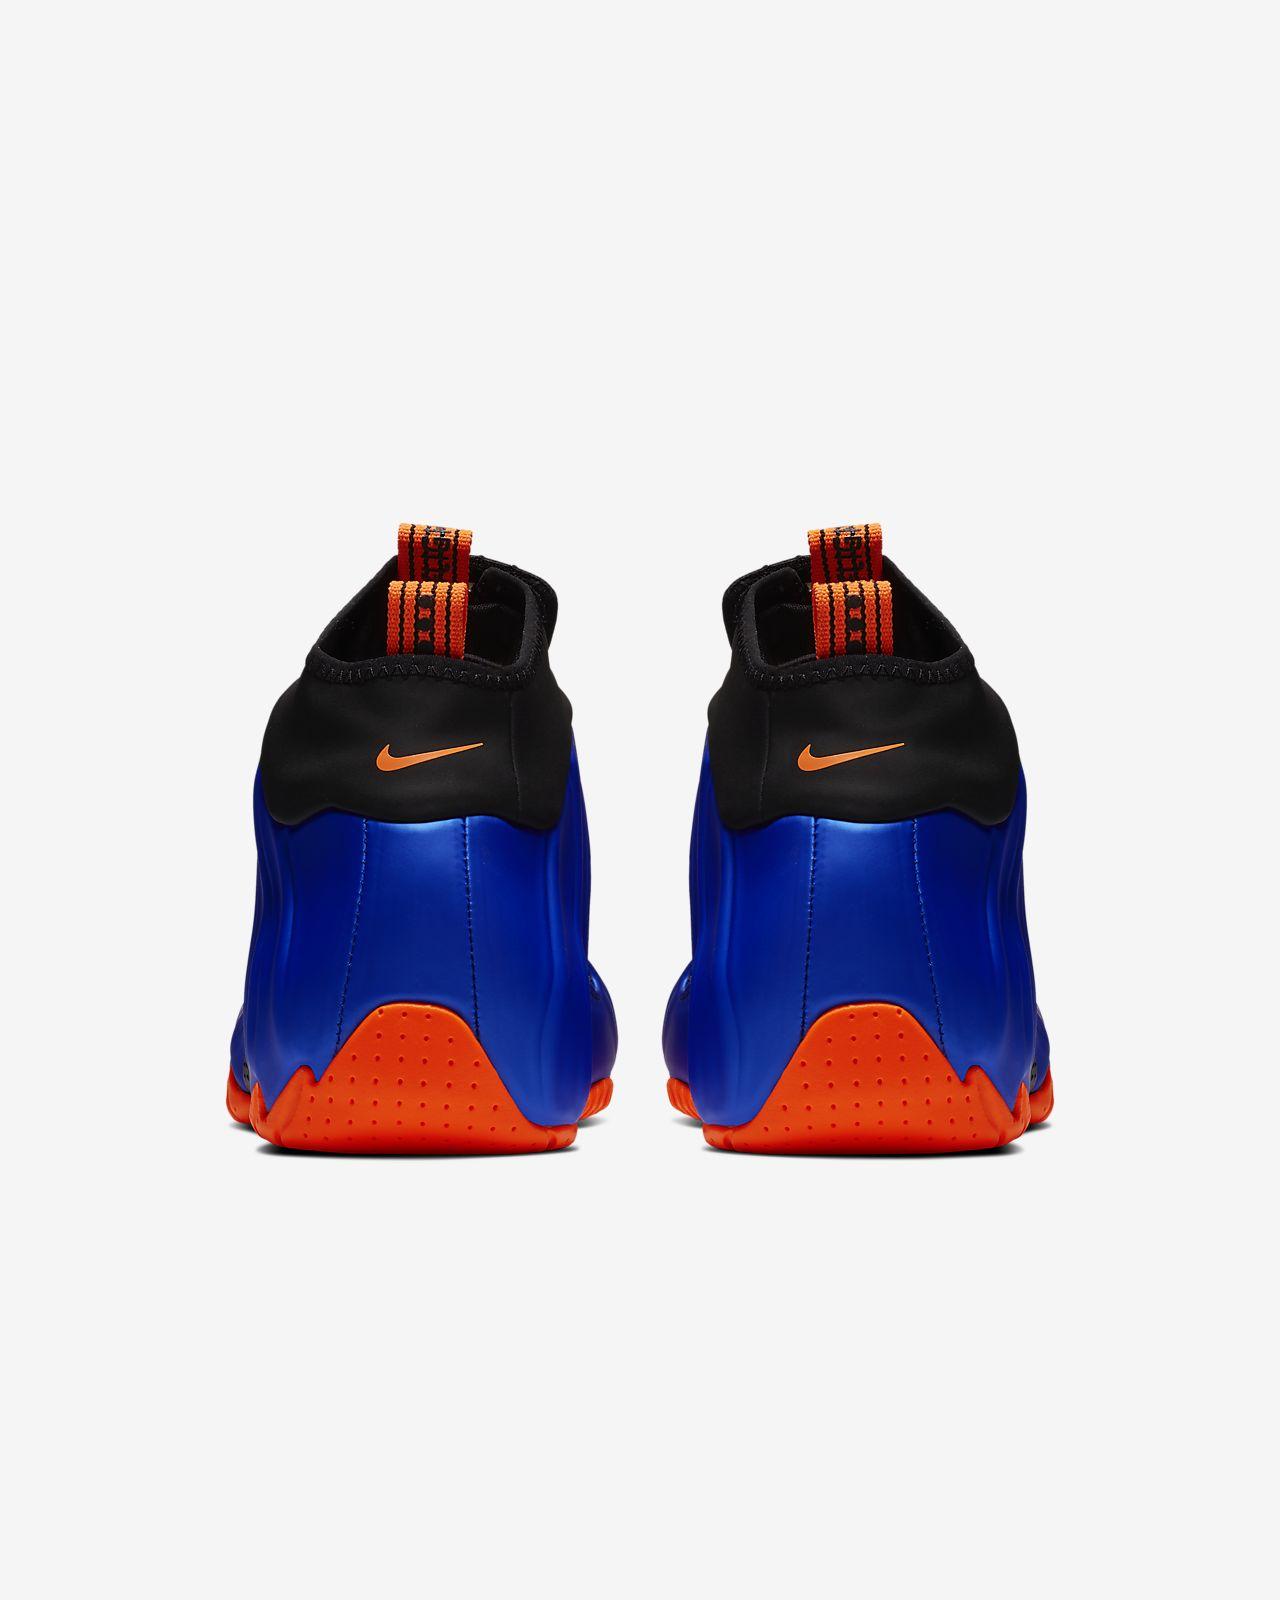 d65f2ce0a65c Nike Air Flightposite Men s Shoe. Nike.com